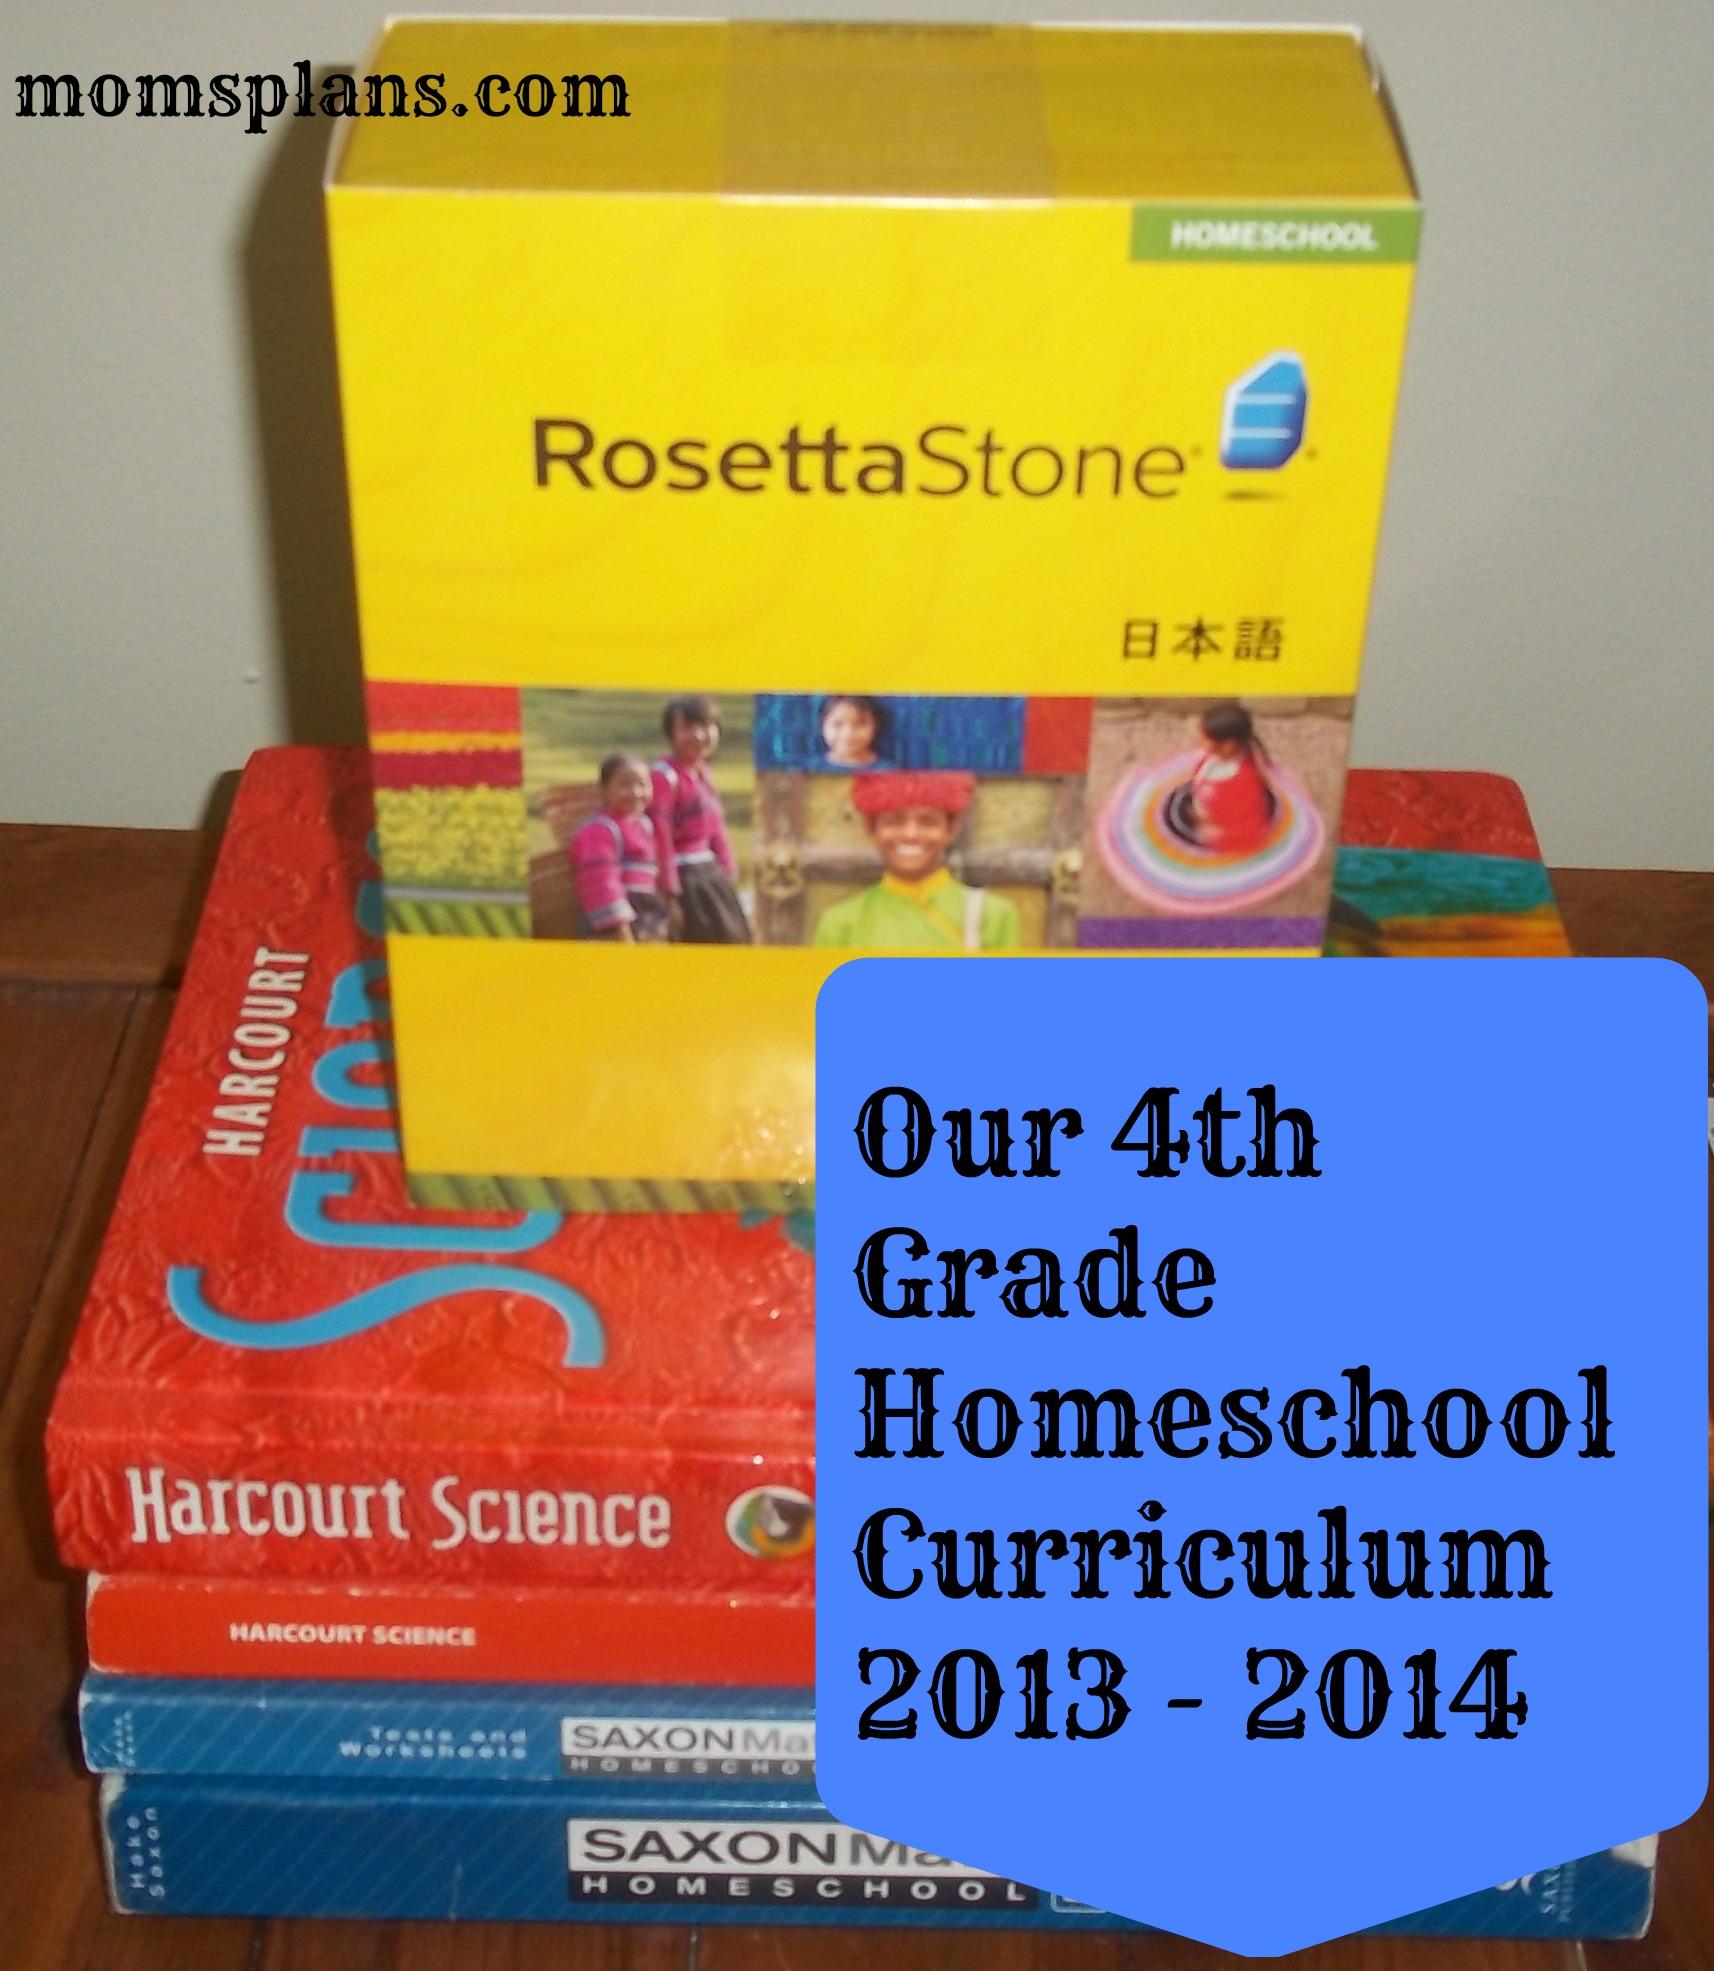 Our 4th Grade Homeschool Curriculum